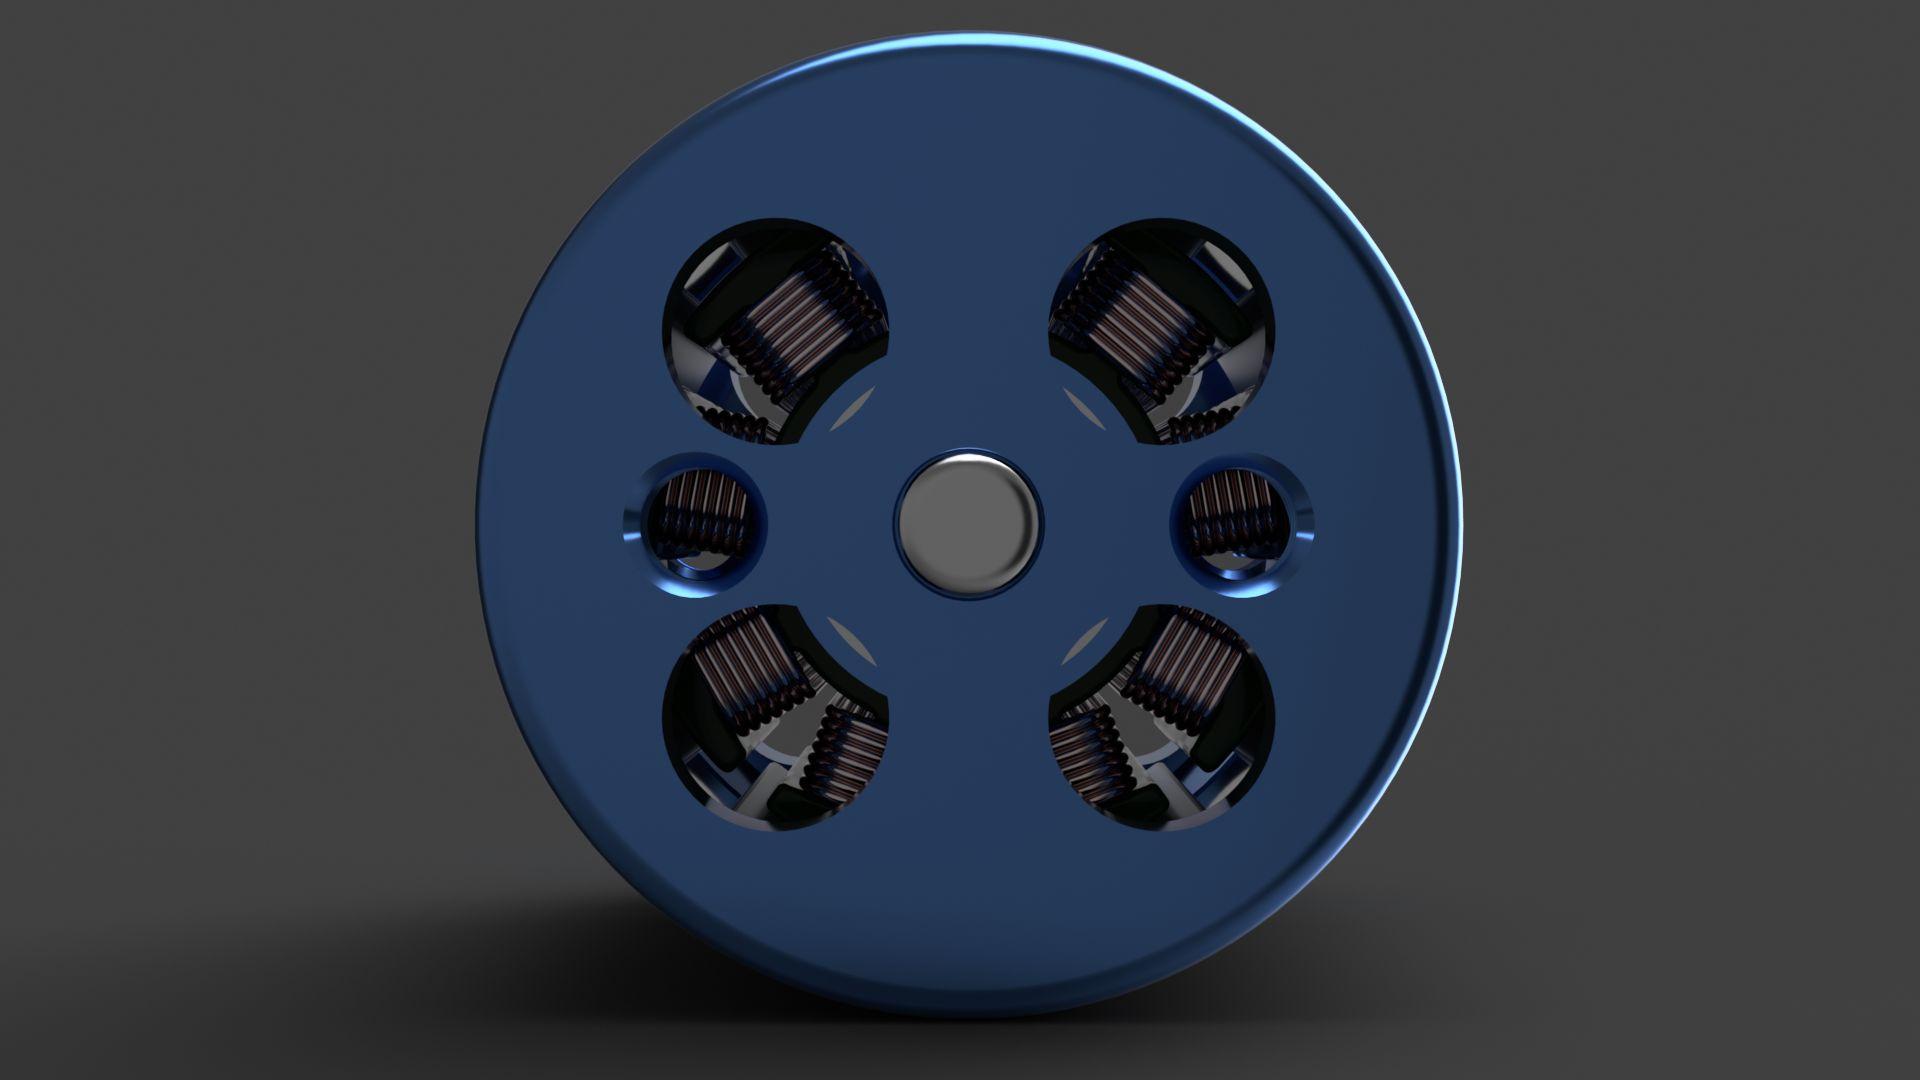 Brushless-motor-d2225-19-1350kv-2017-jun-29-10-04-56am-000-customizedview18407881396-3500-3500